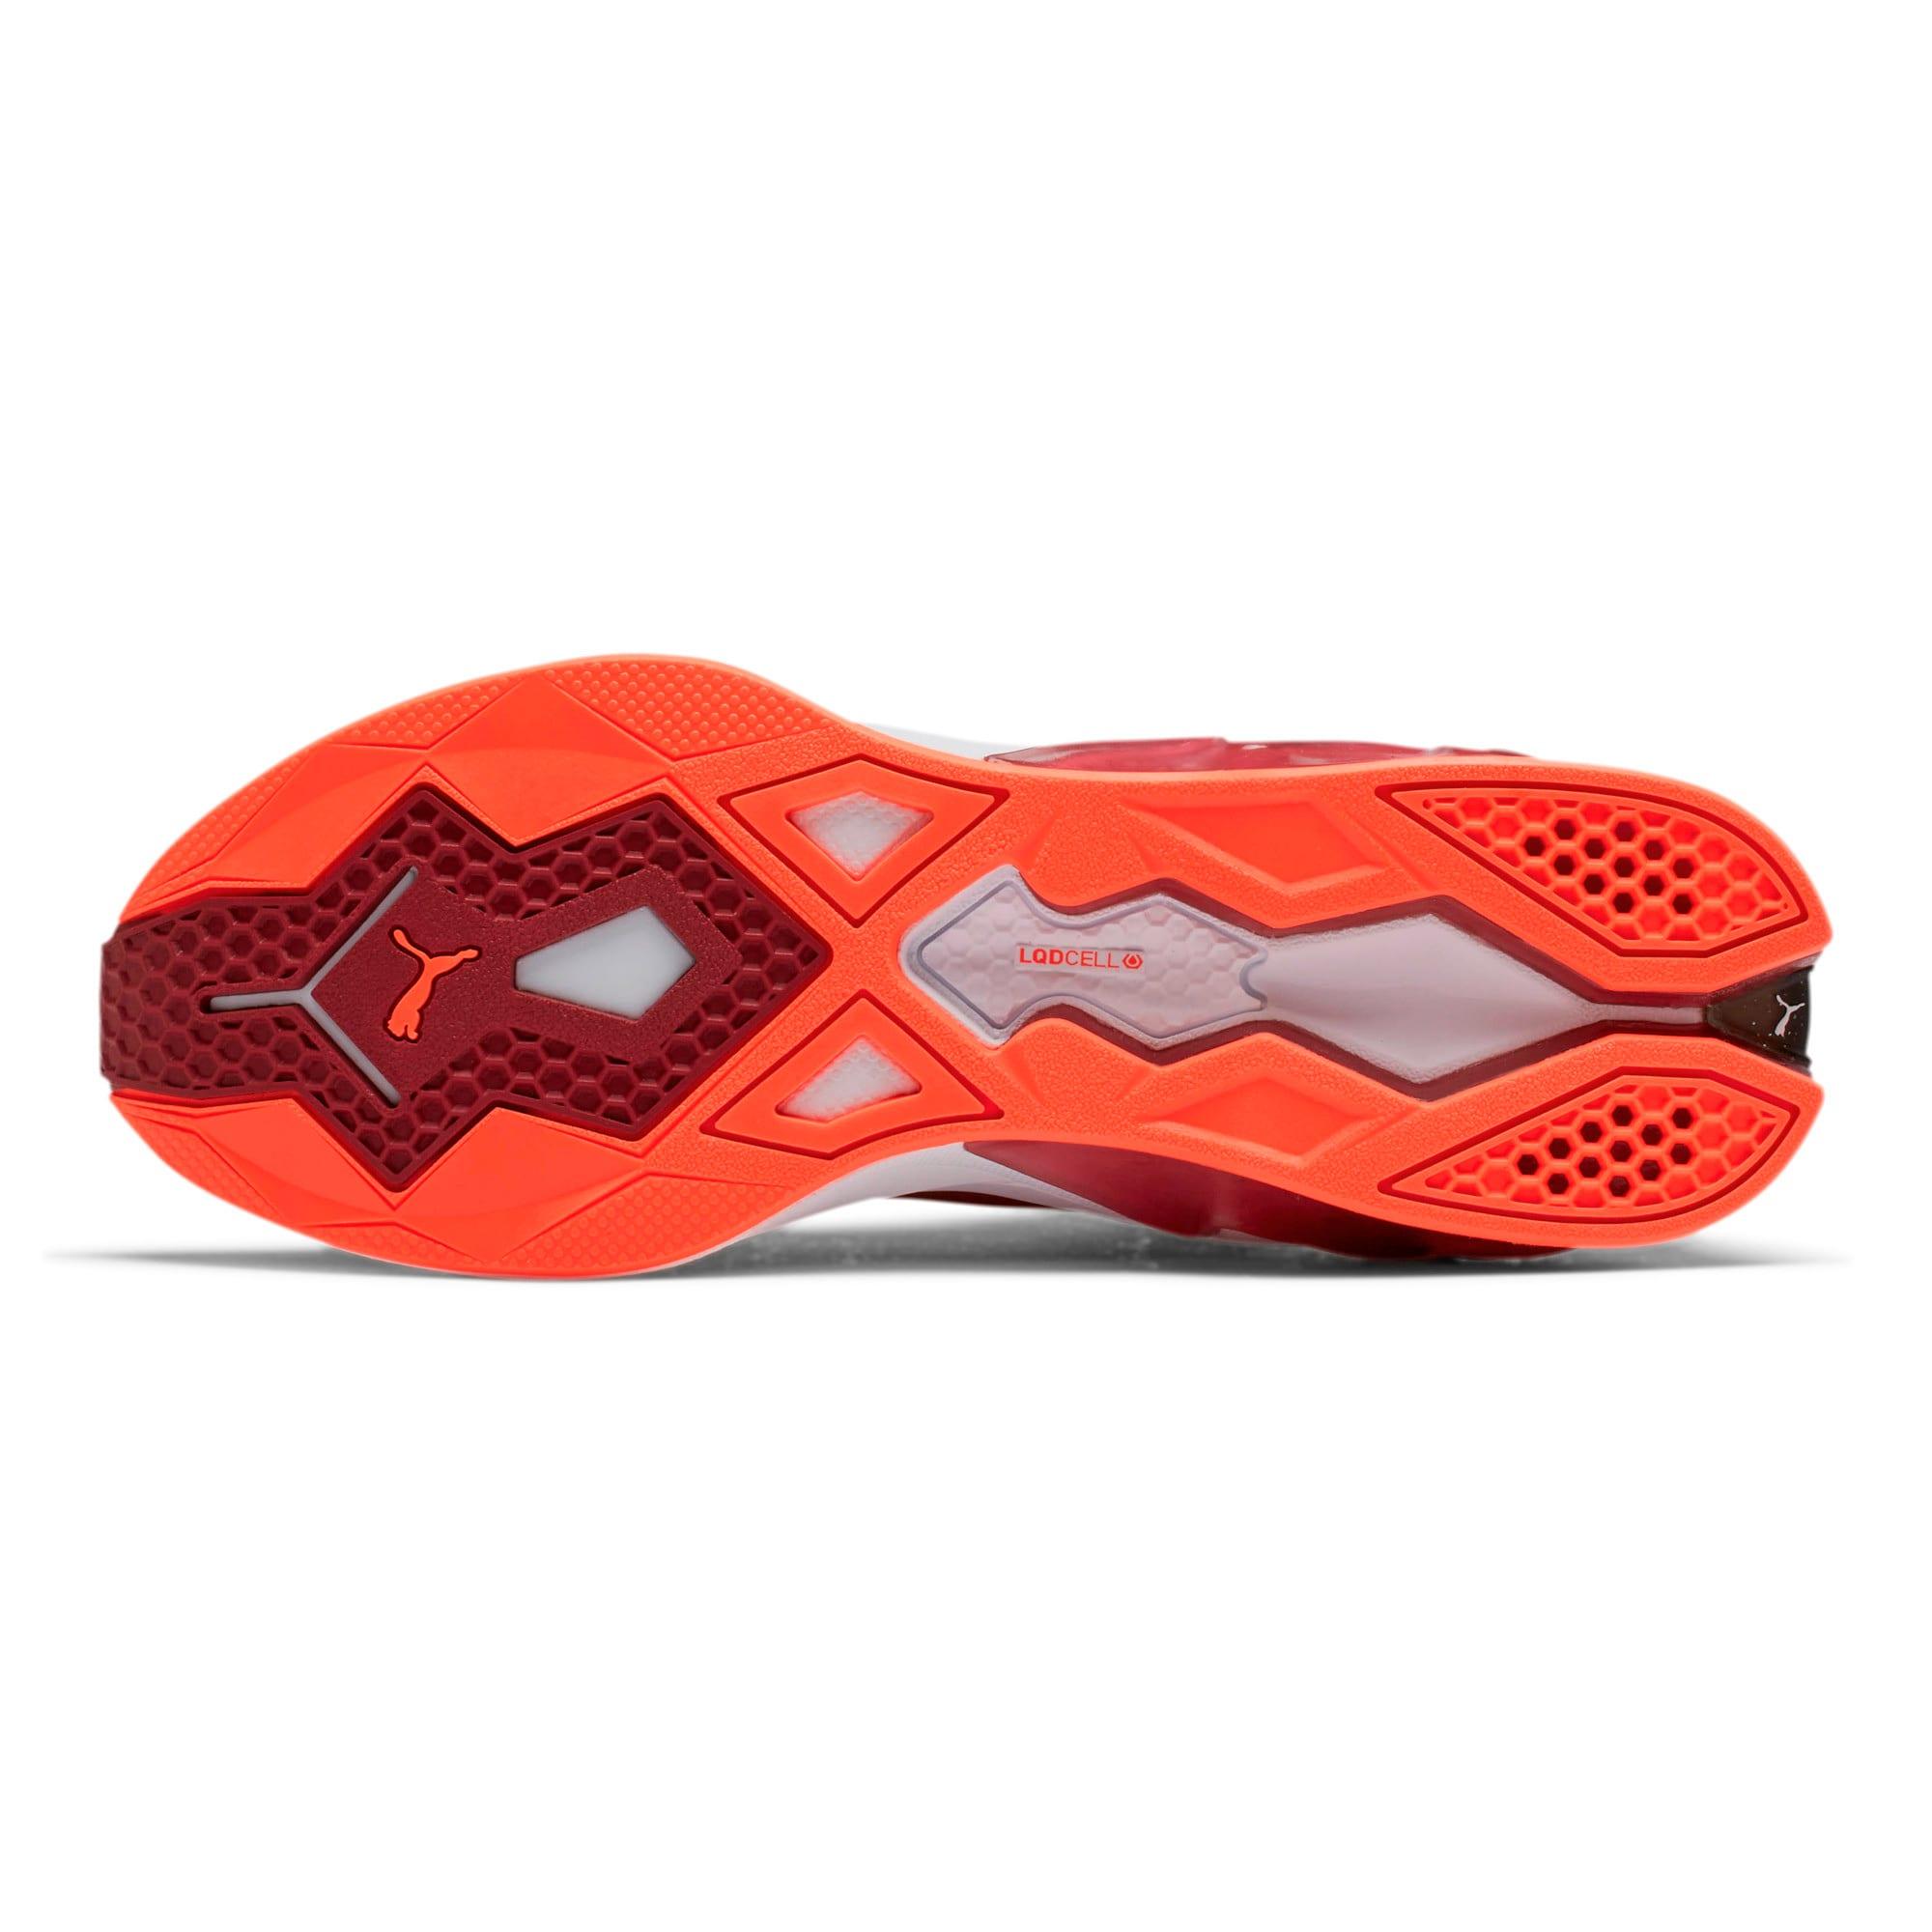 Thumbnail 5 of LQDCELL Origin Tech Men's Training Shoes, Puma Black-Rhubarb, medium